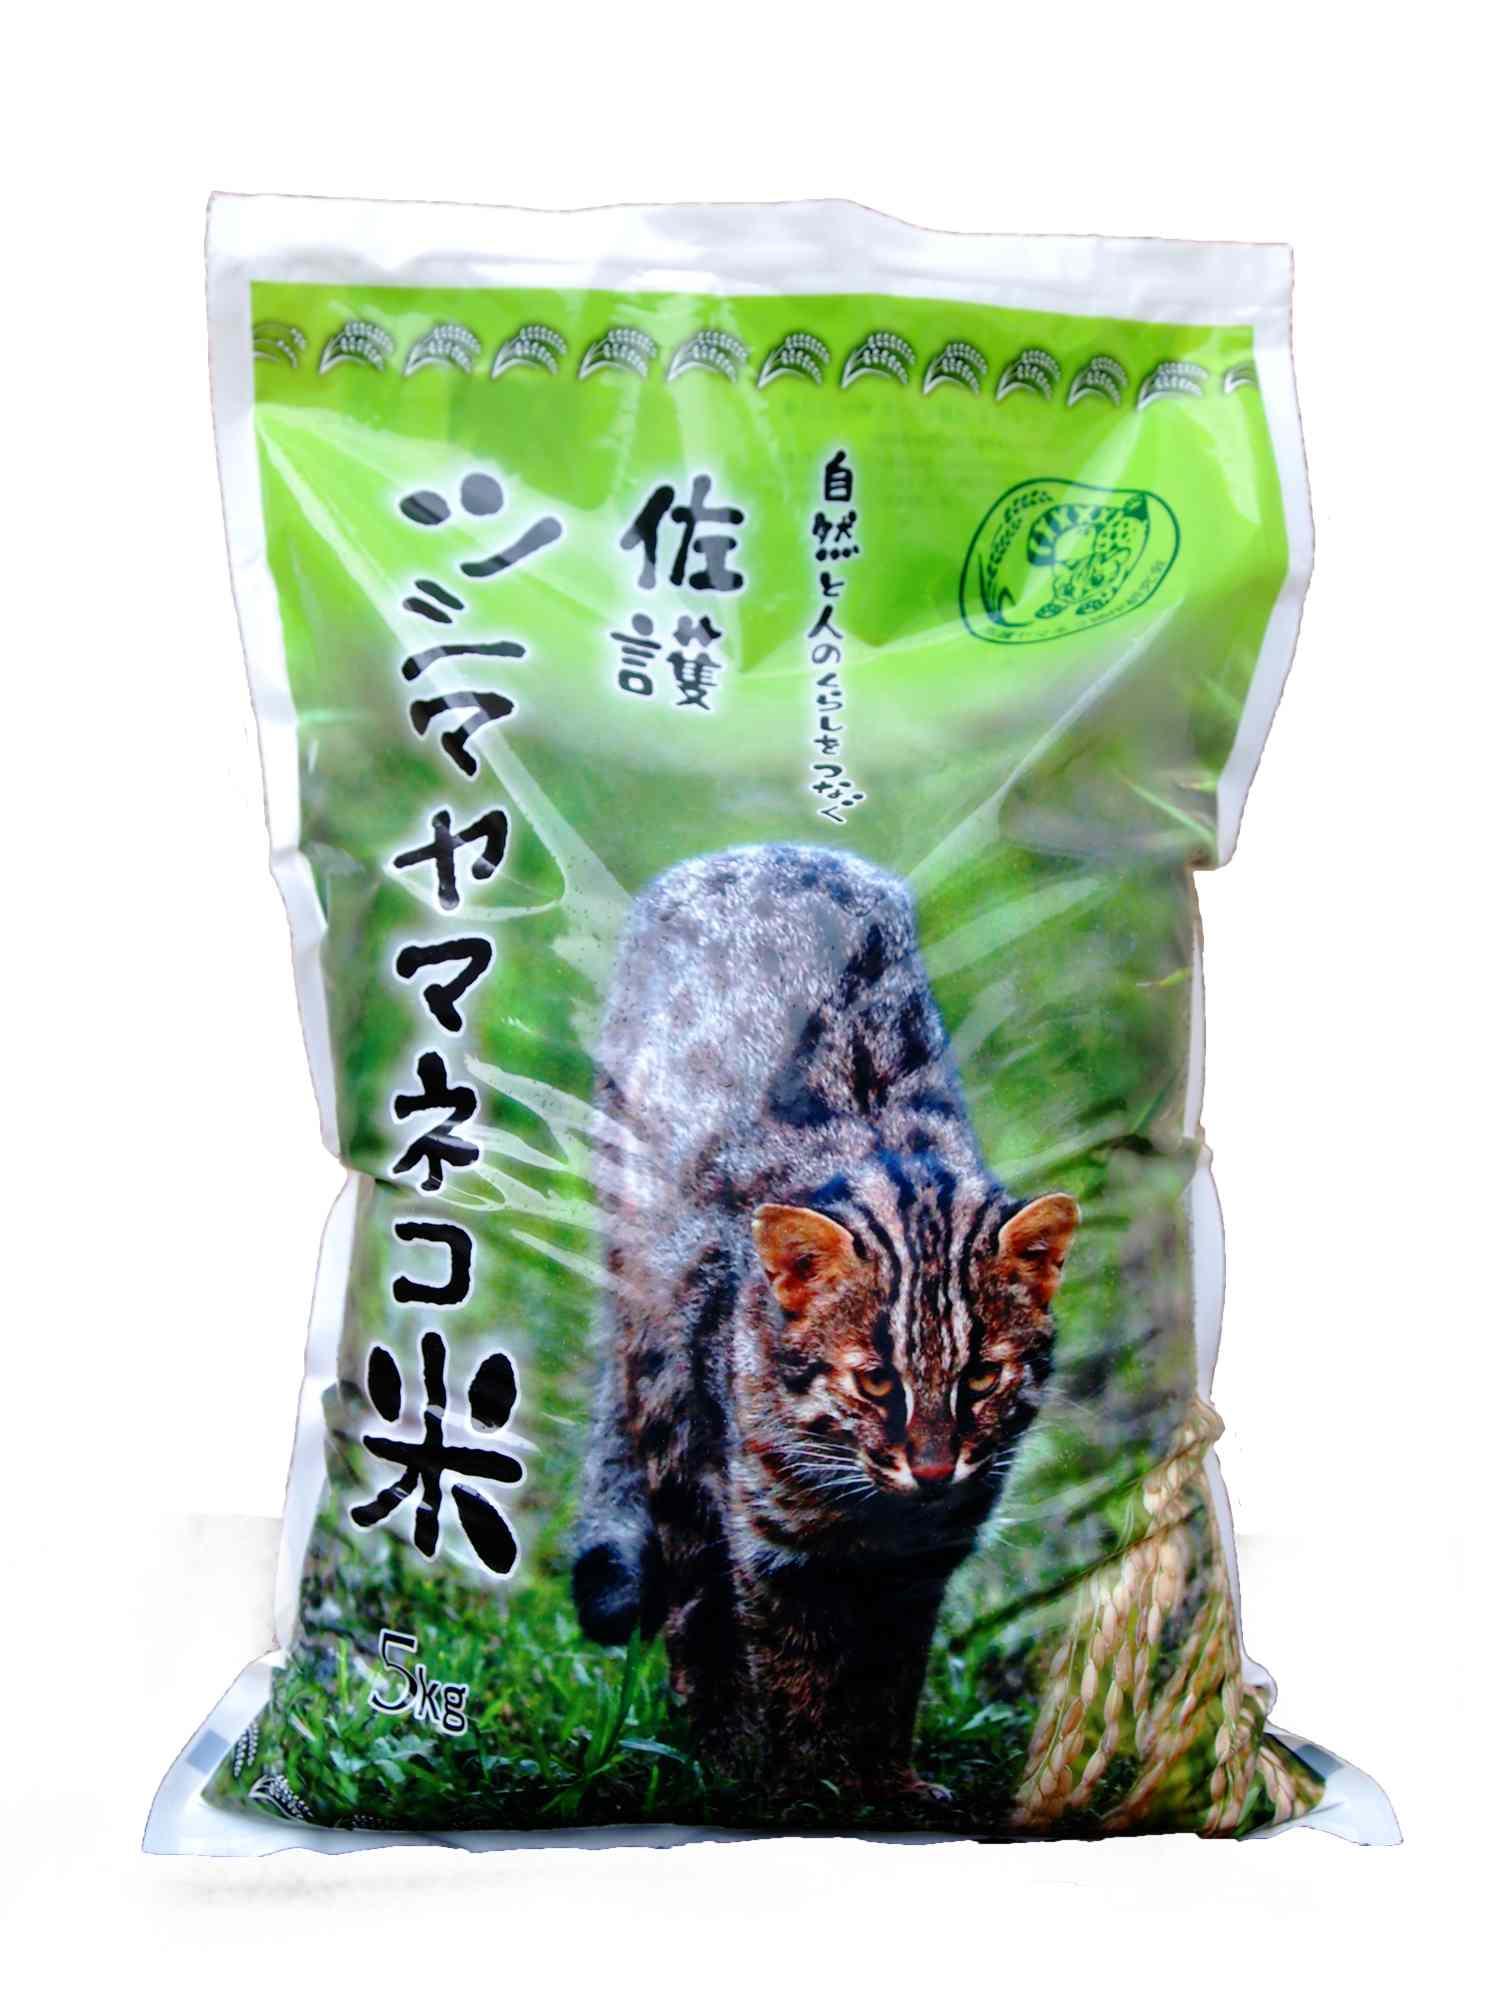 【5Kg袋単品】『自然と人のくらしをつなぐ佐護ツシマヤマネコ米』